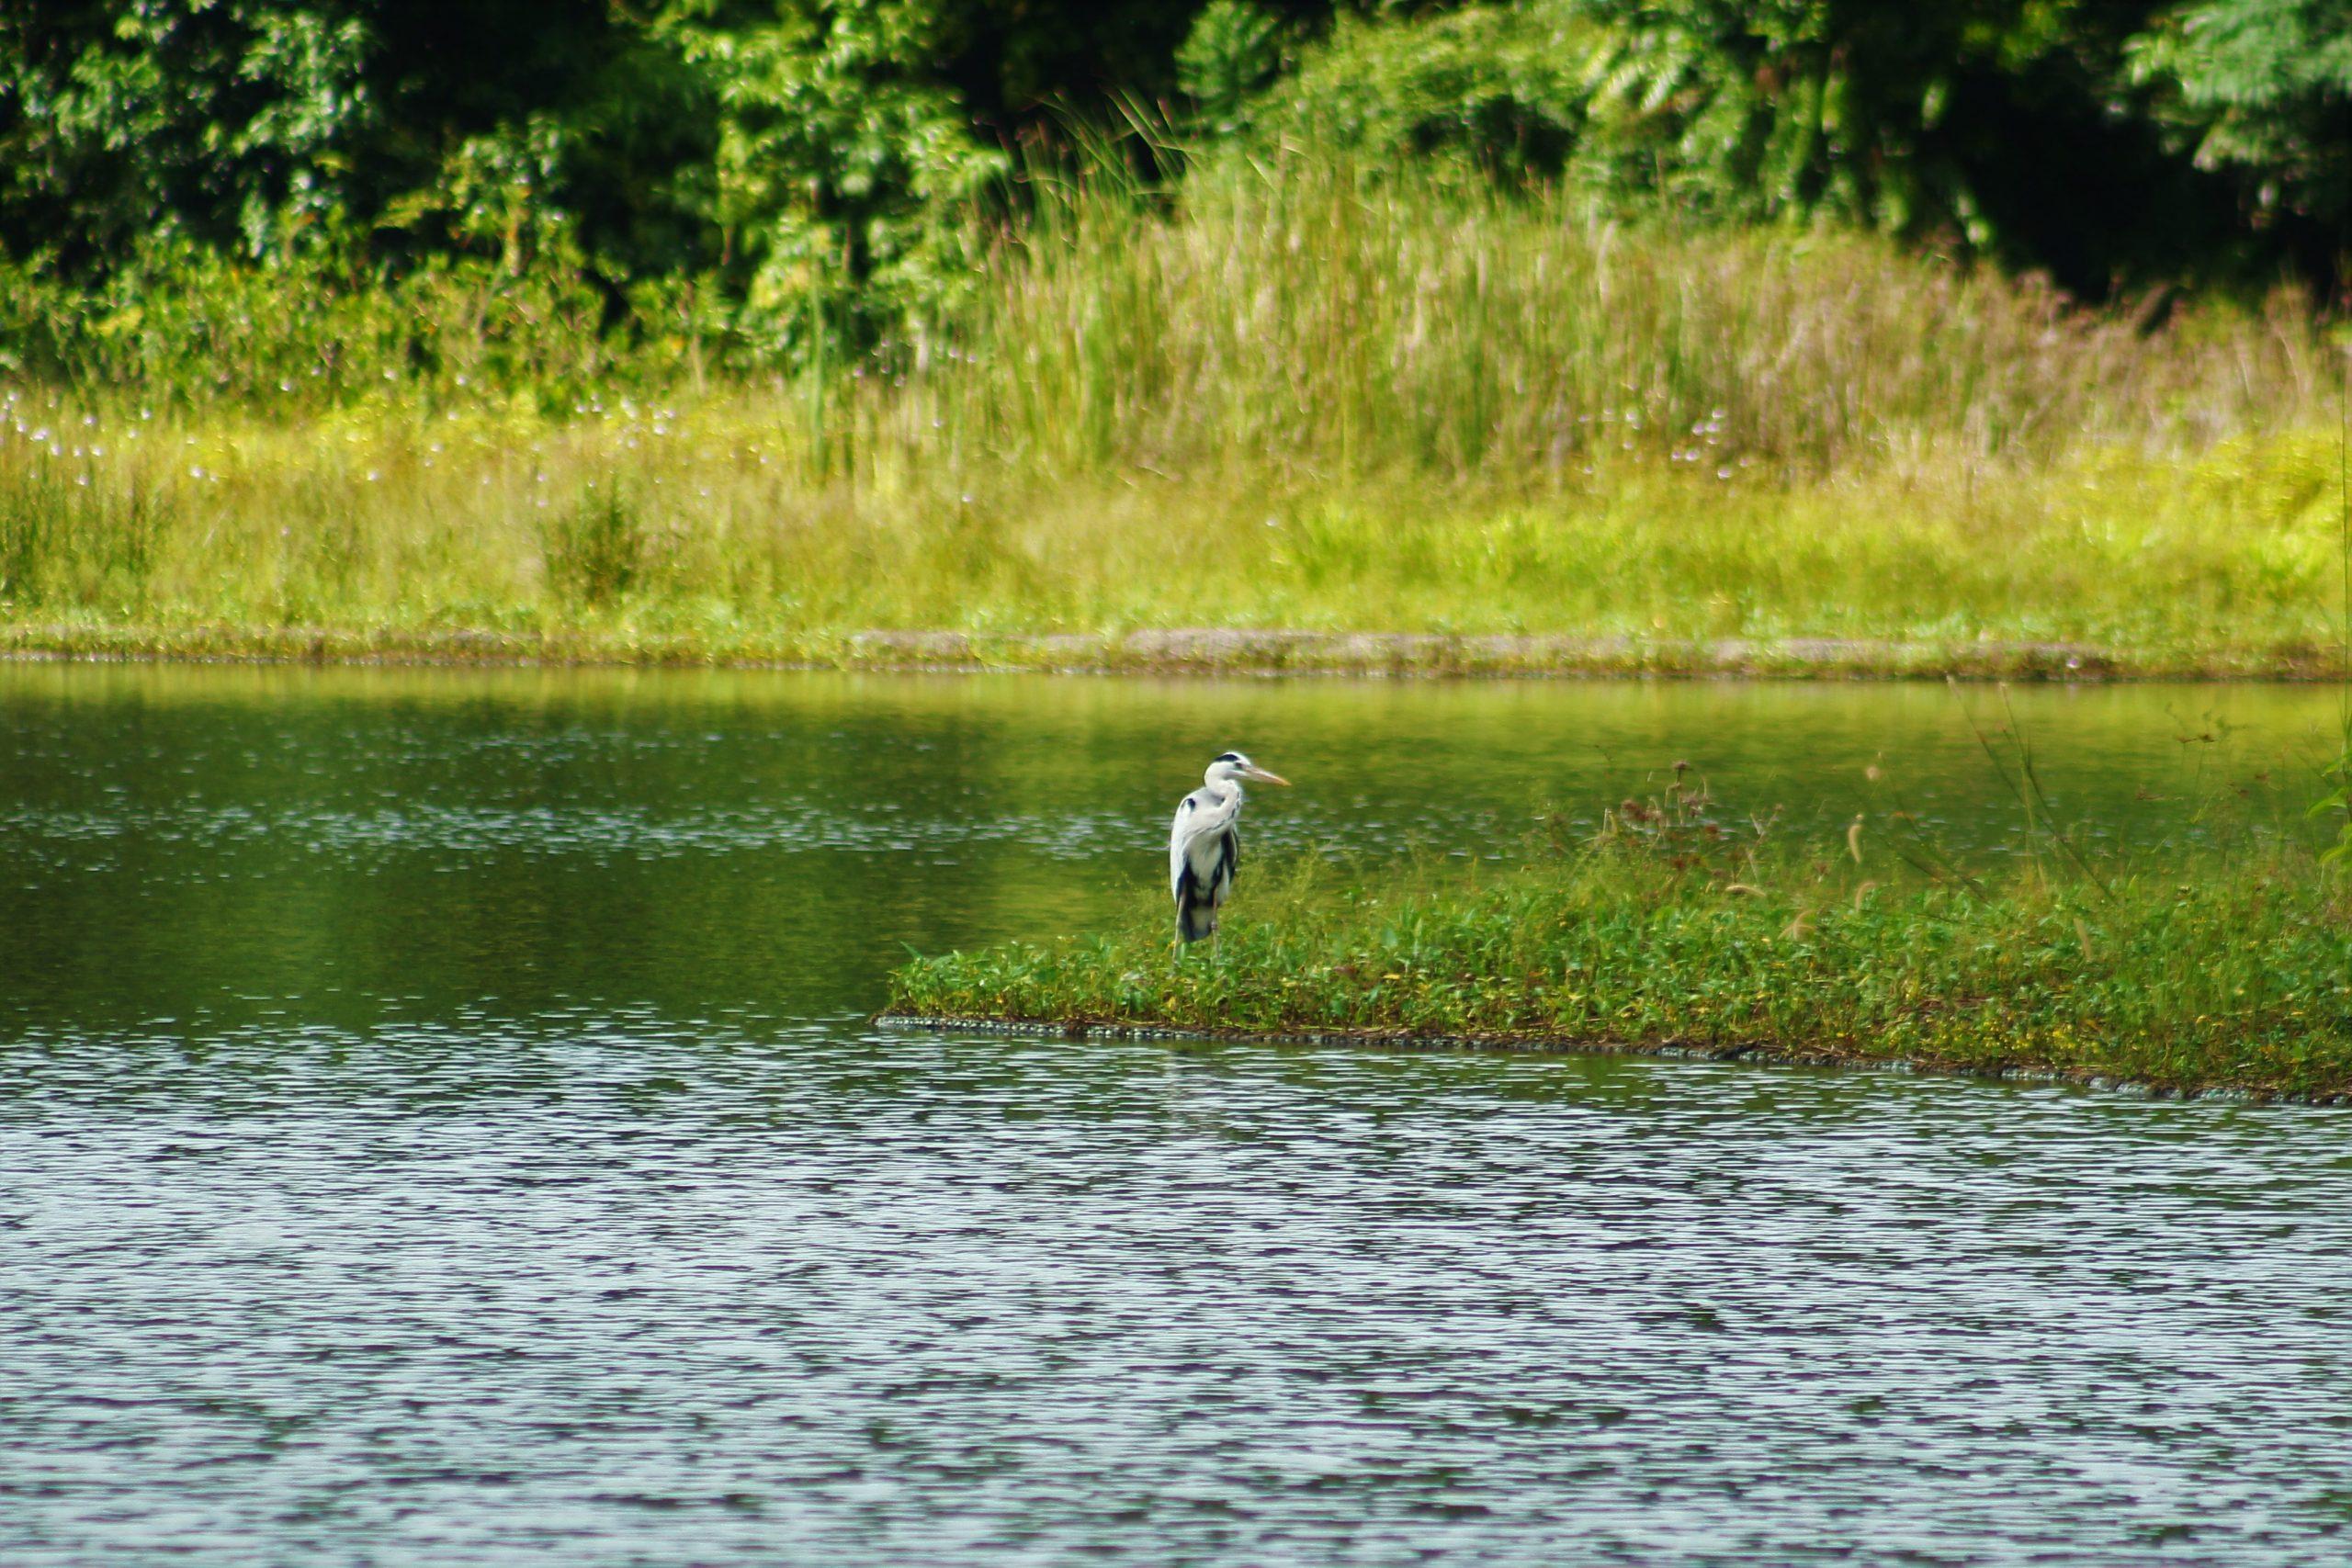 Pekan Quarry is a habitat for herons